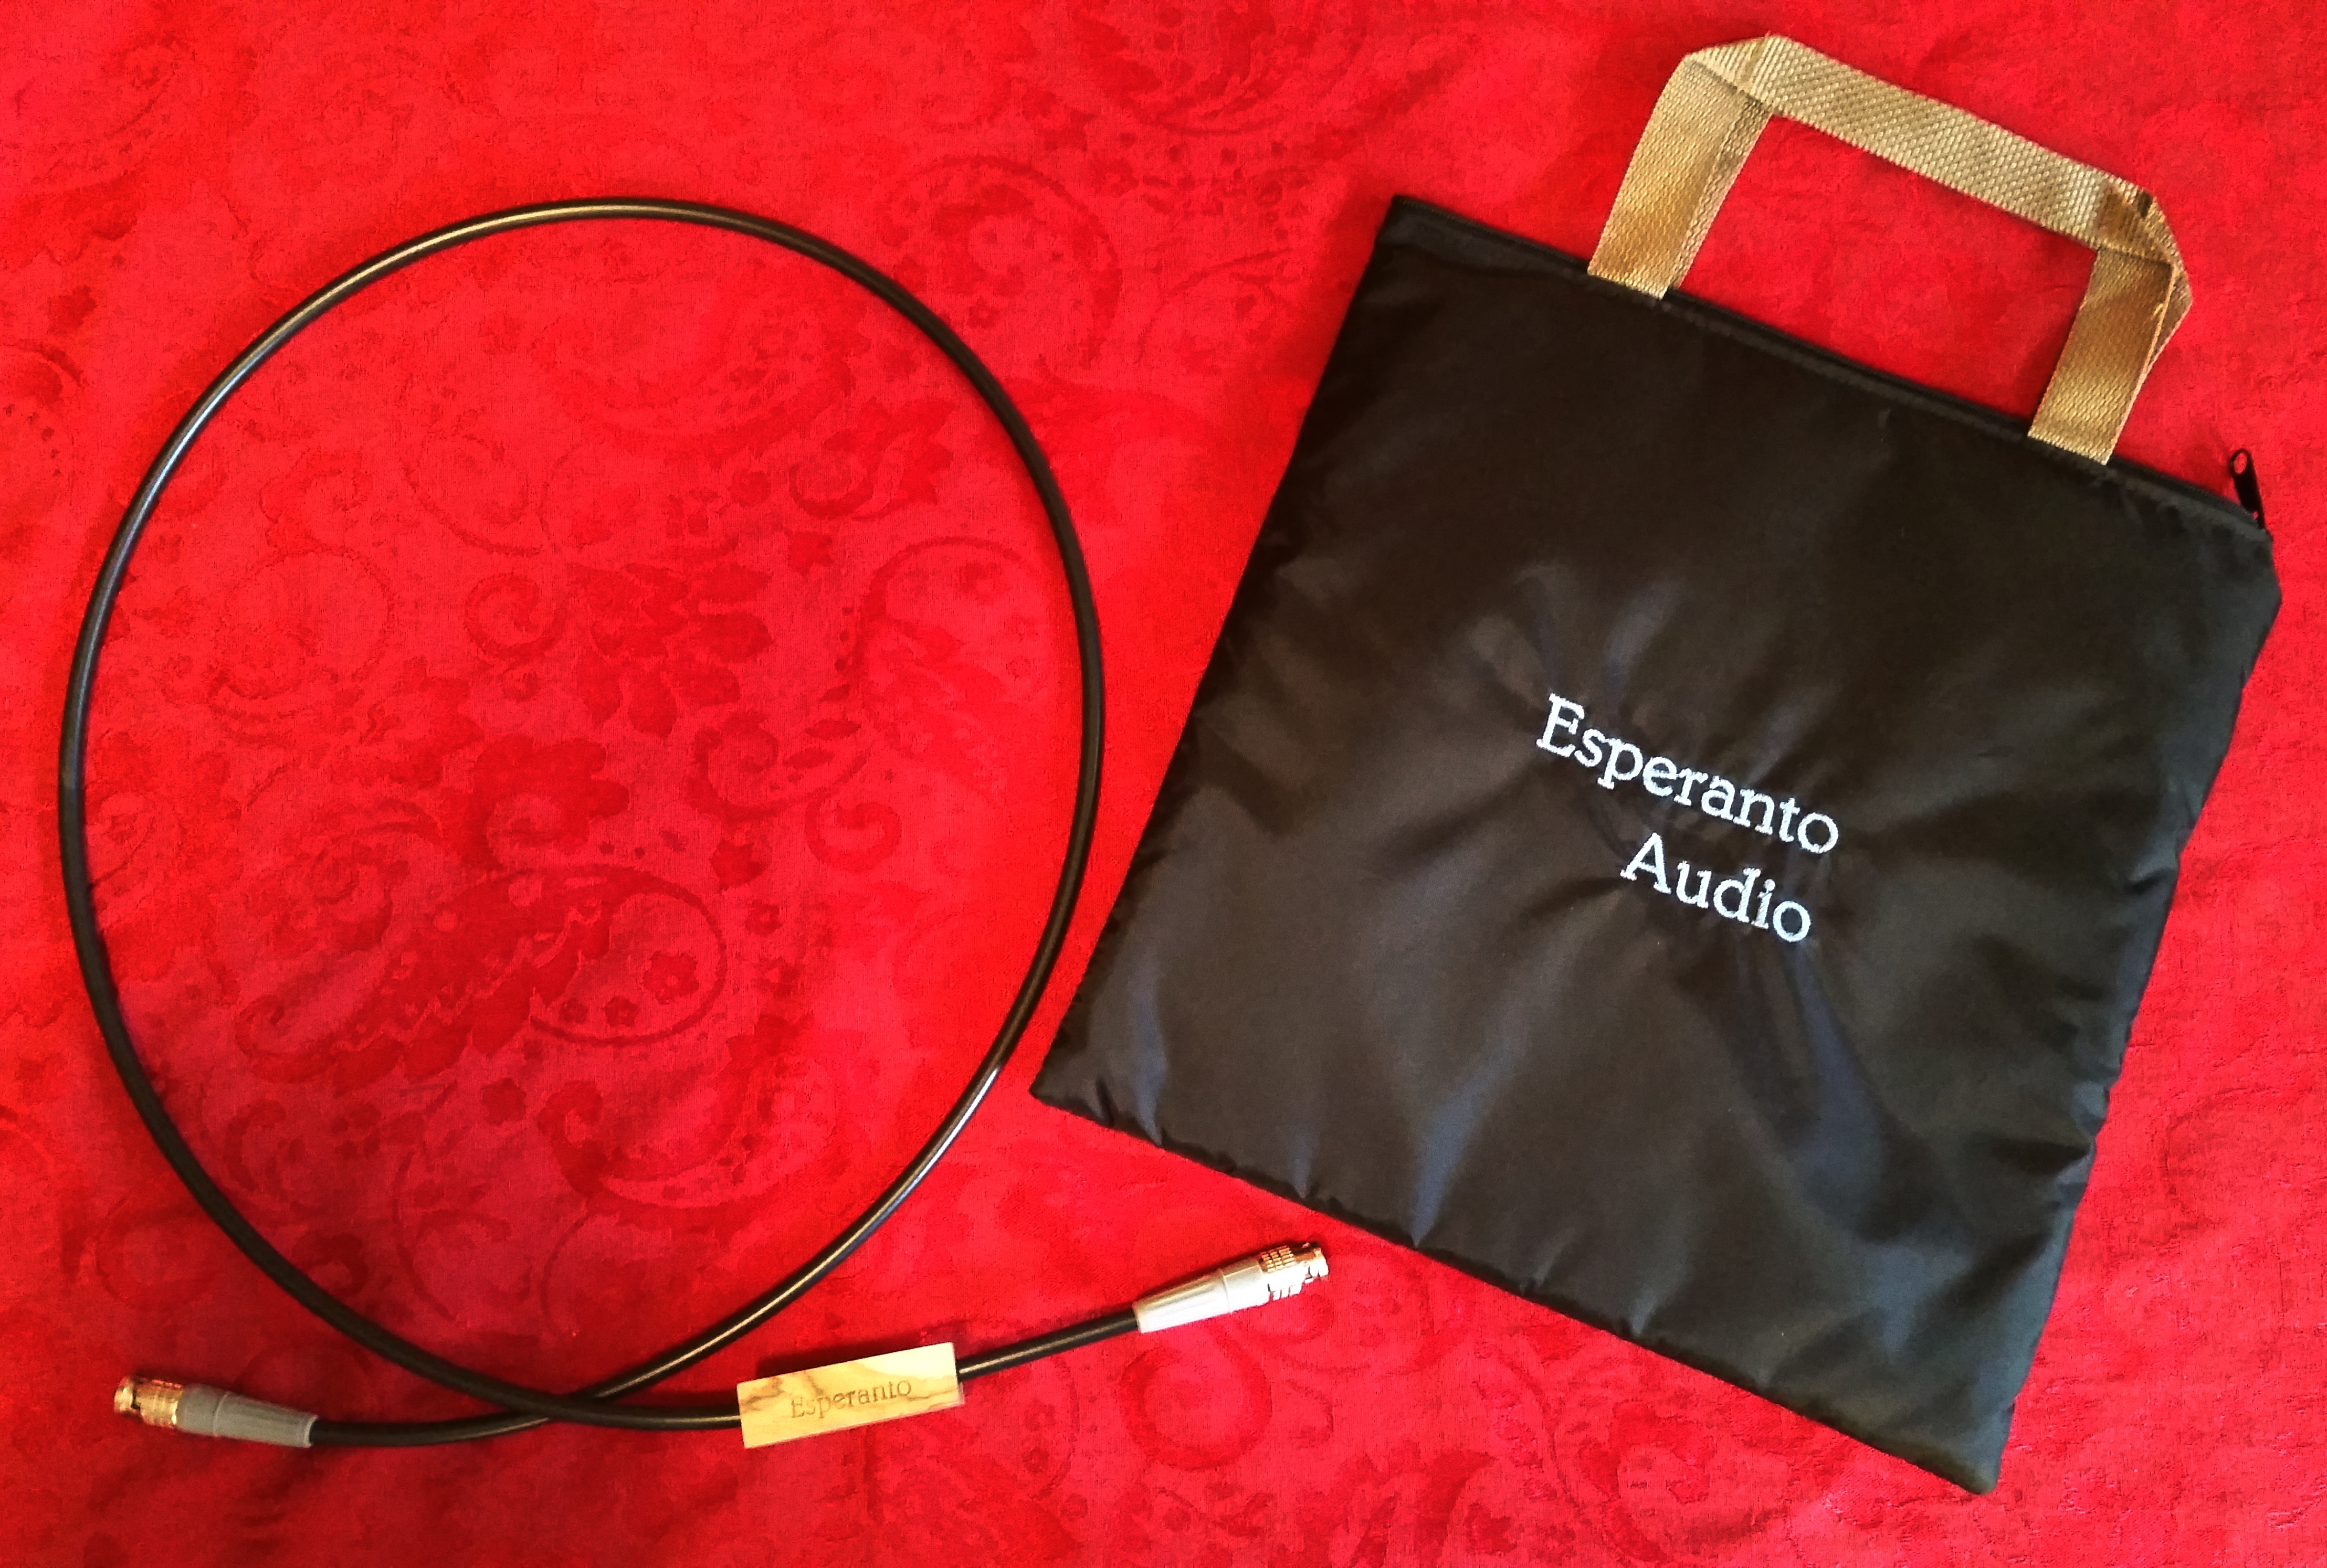 Esperanto Audio Black SPDIF Cable